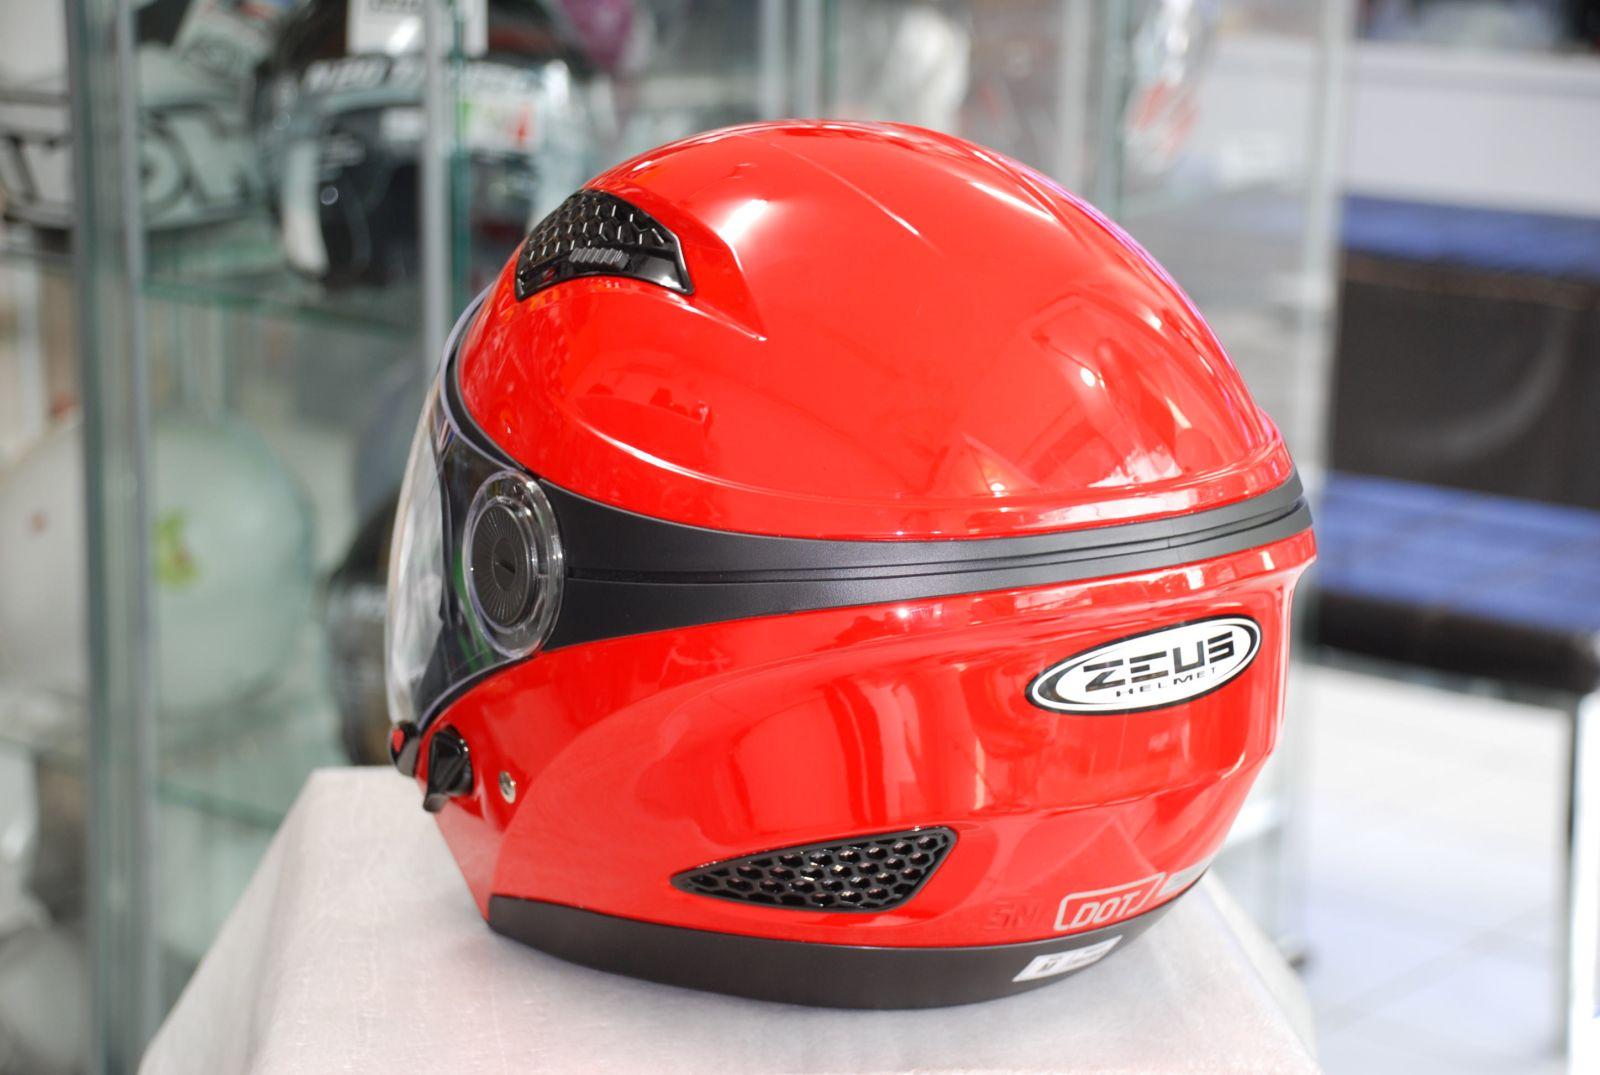 Buy New Zeus Z 610 Stripe Helmet Half Face Double Visor Deals For Helm Zs Glossy Silver